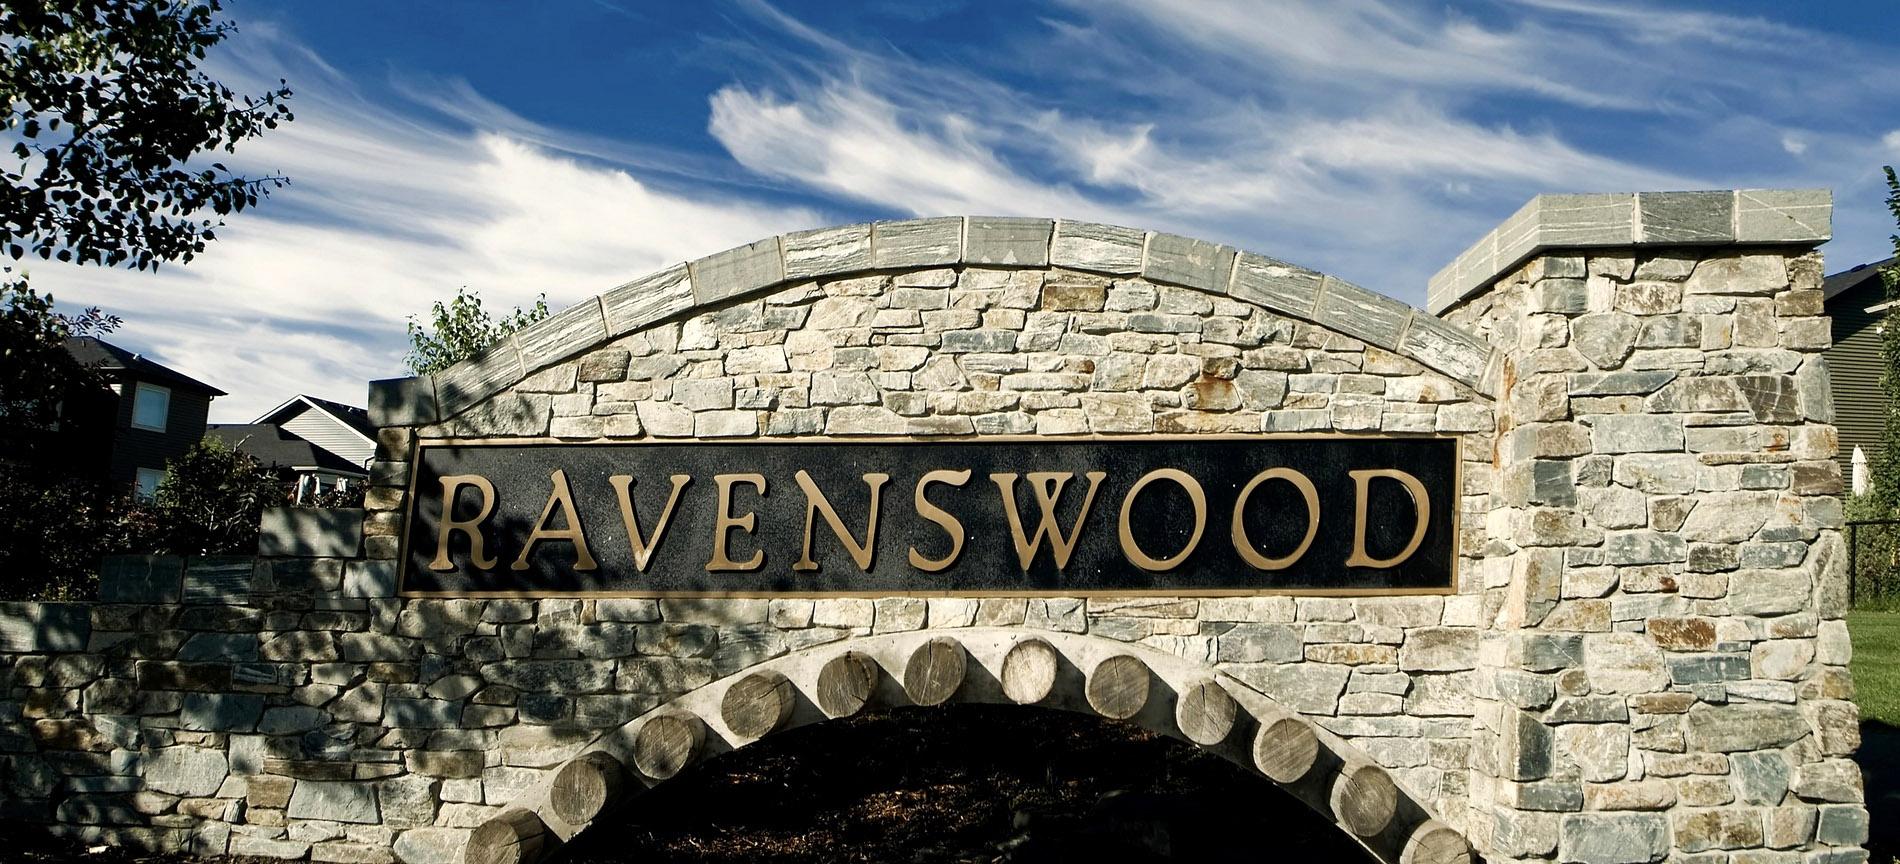 RavenswoodArch1900x864.jpg